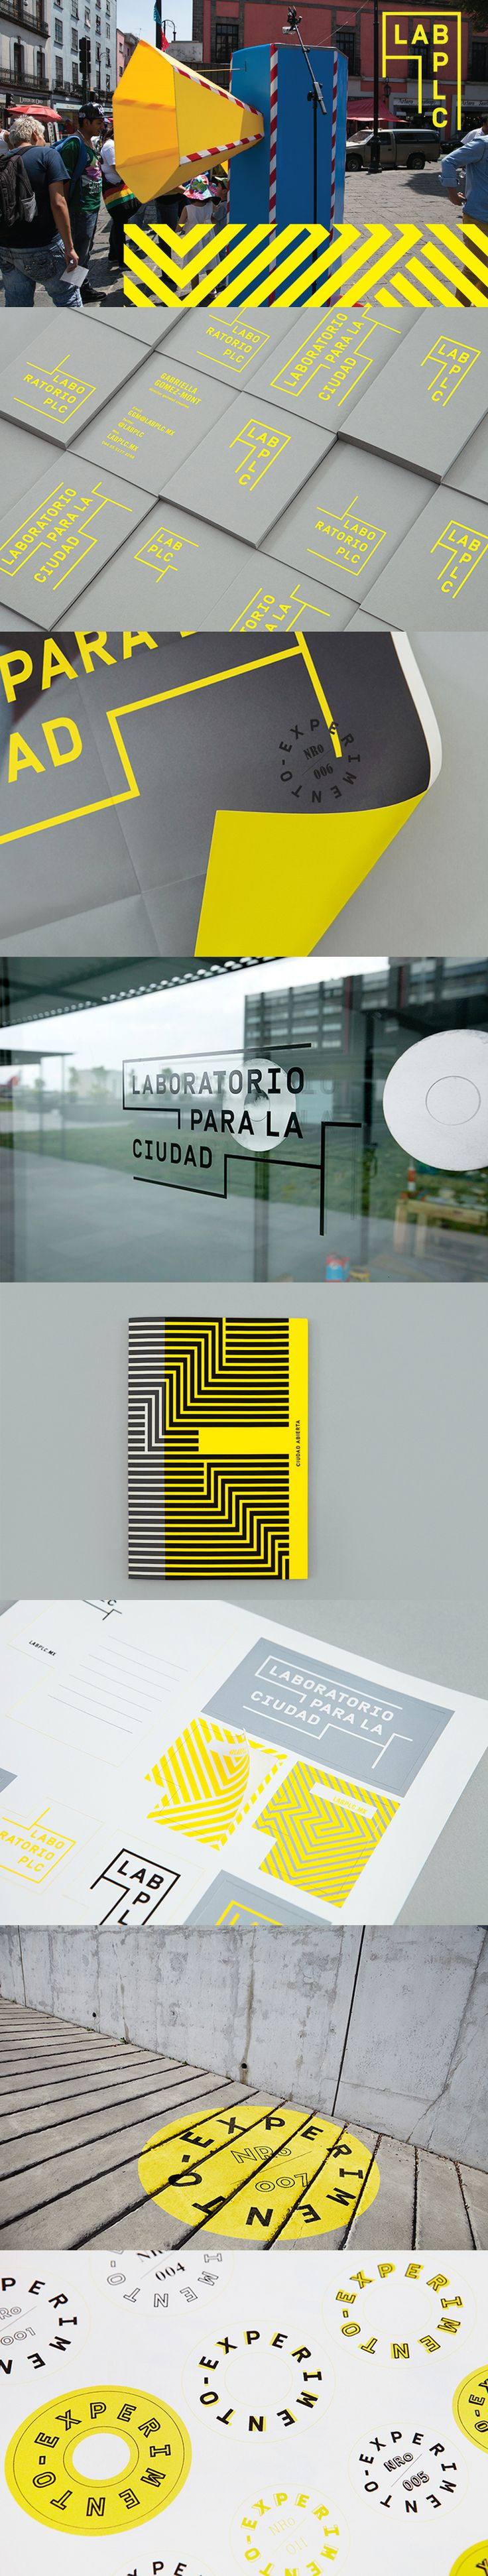 Labotatorio Parala Cuidad. (More design inspiration at www.aldenchong.com)